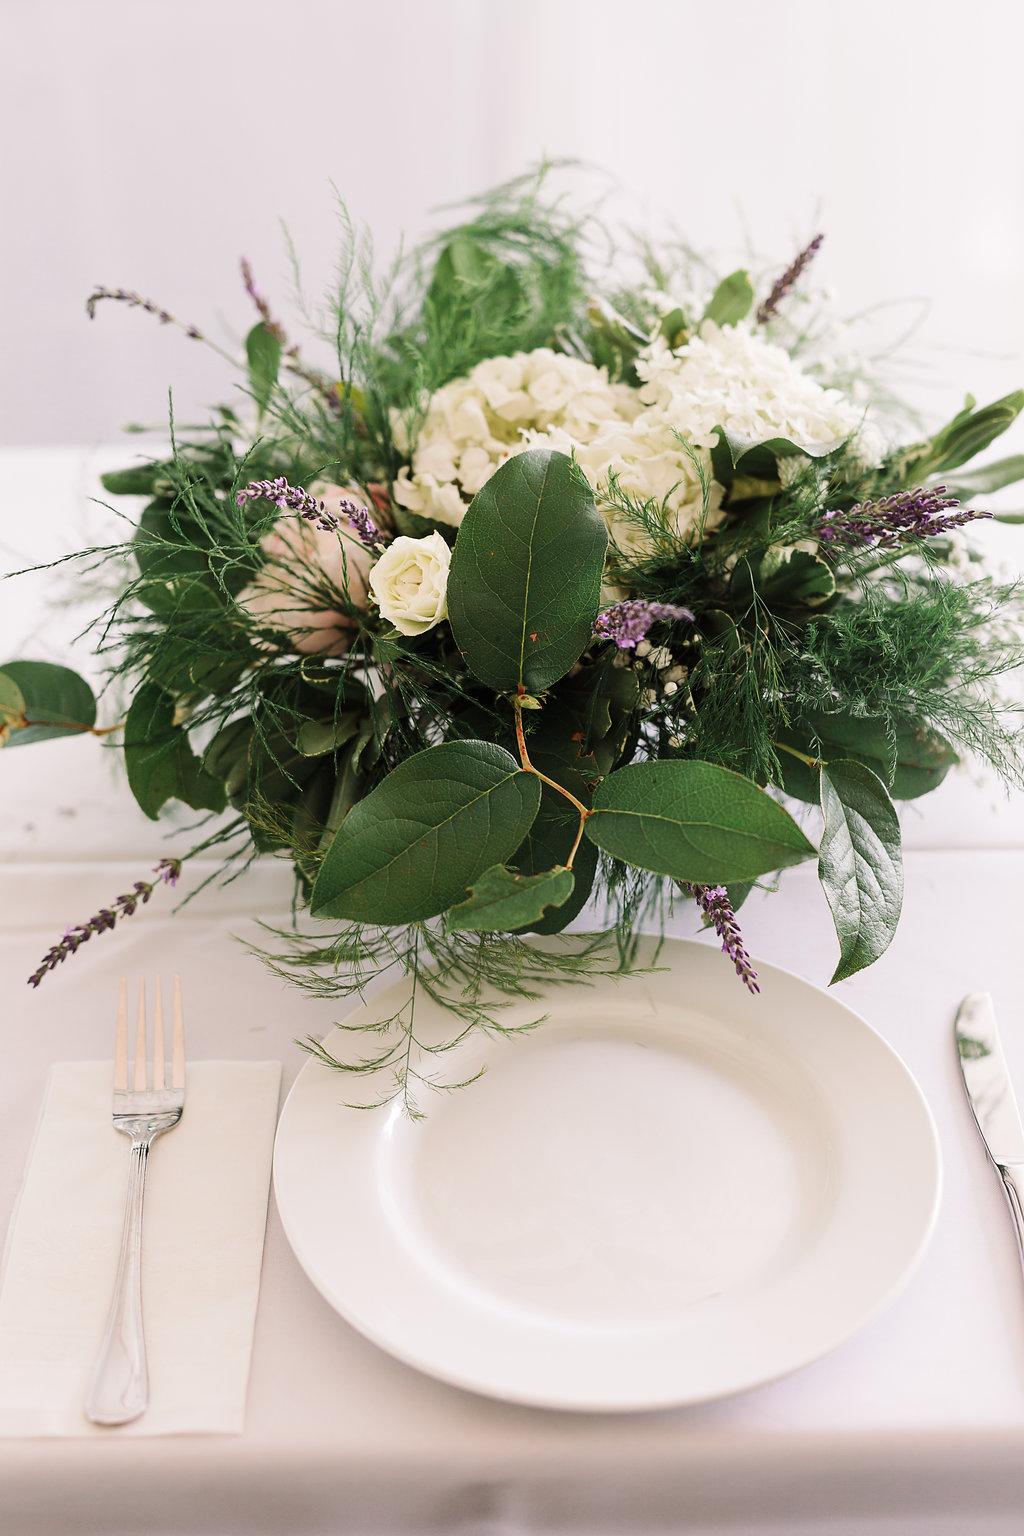 NormanPhotoPaper_PondMcPhersonPituch_Wedding-425.jpg